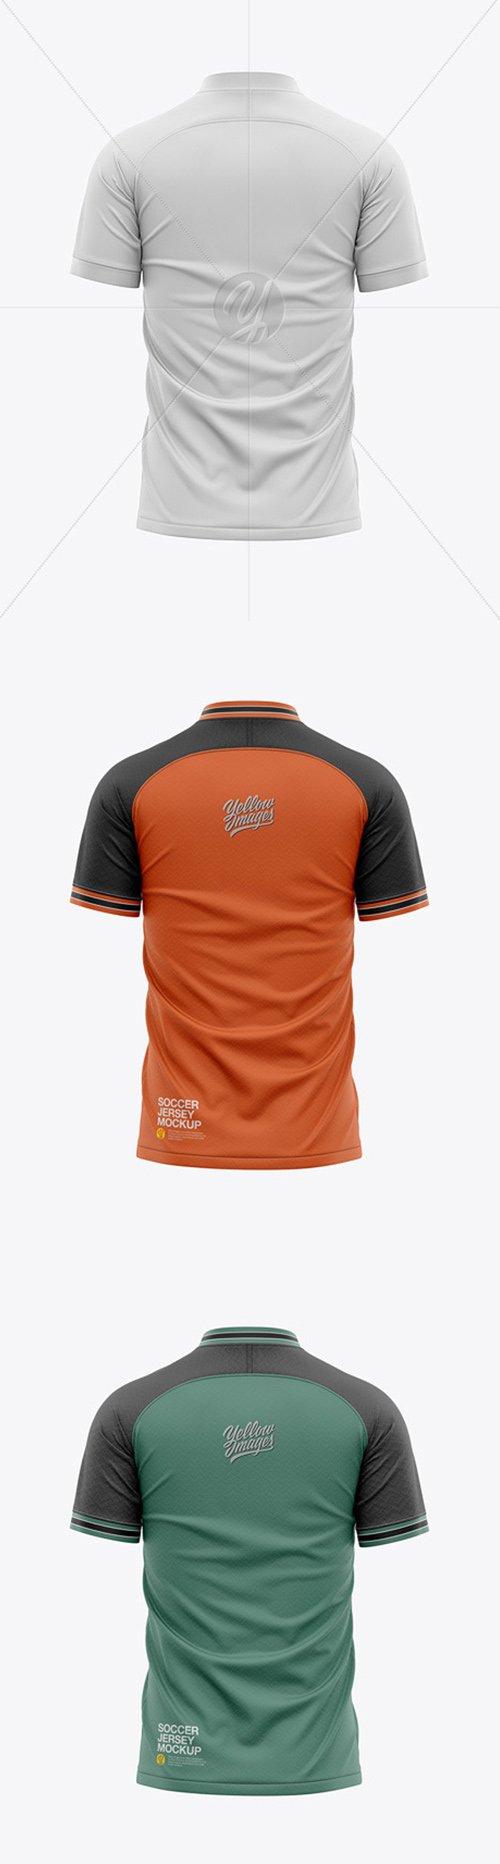 Mens Soccer Raglan Jersey Mockup - Back View 49718